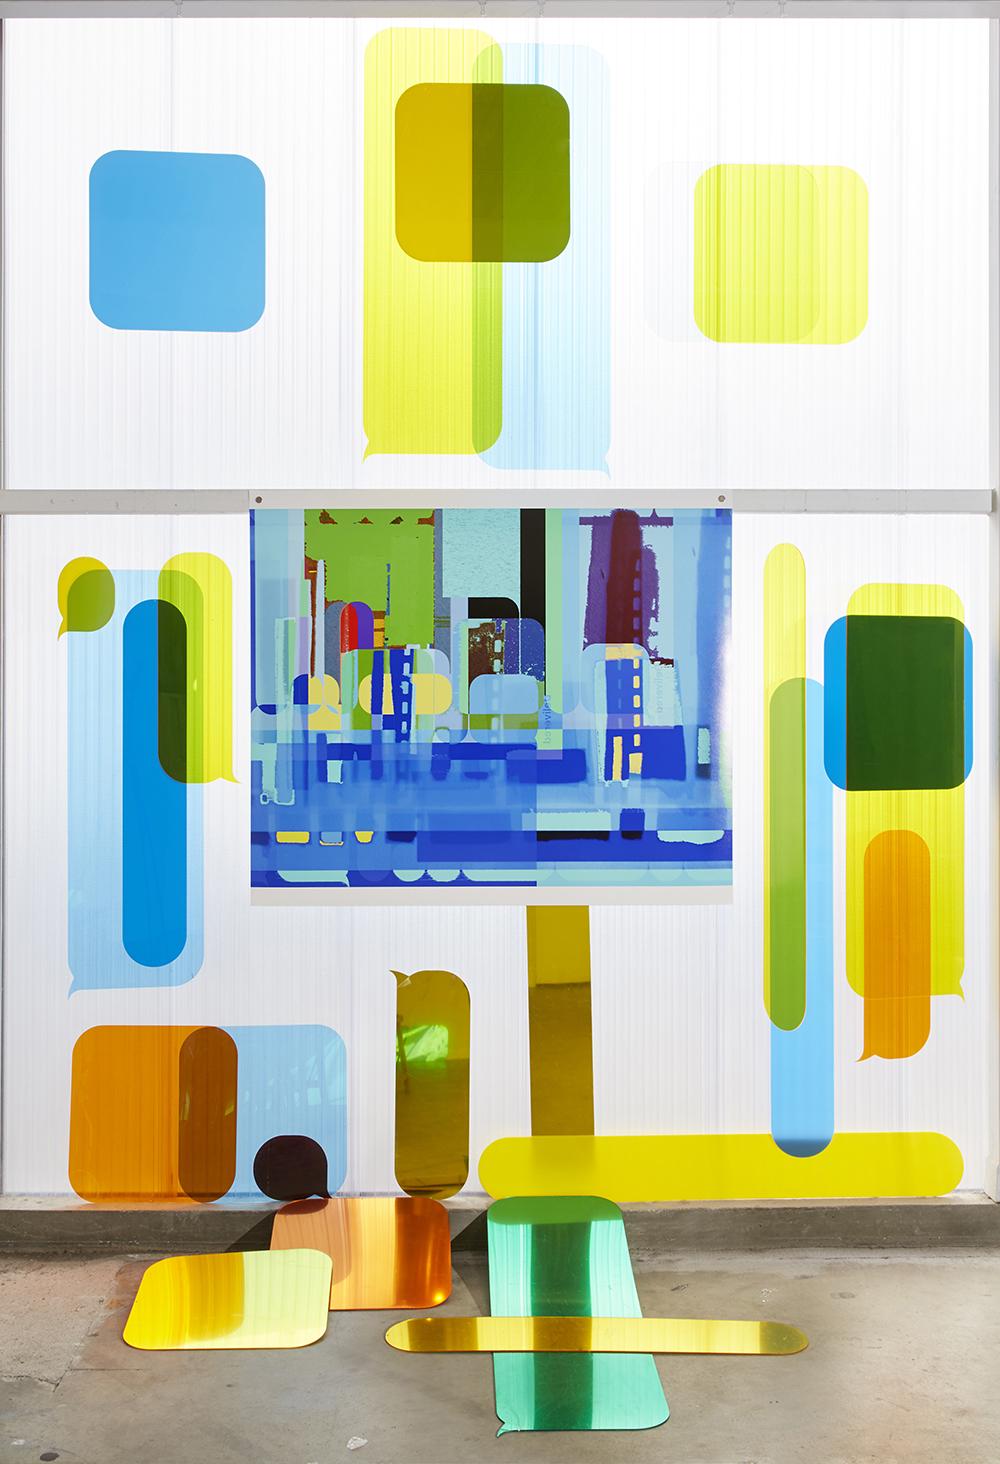 """t e x t s c a p e"" Exhibition at Canopy Austin"